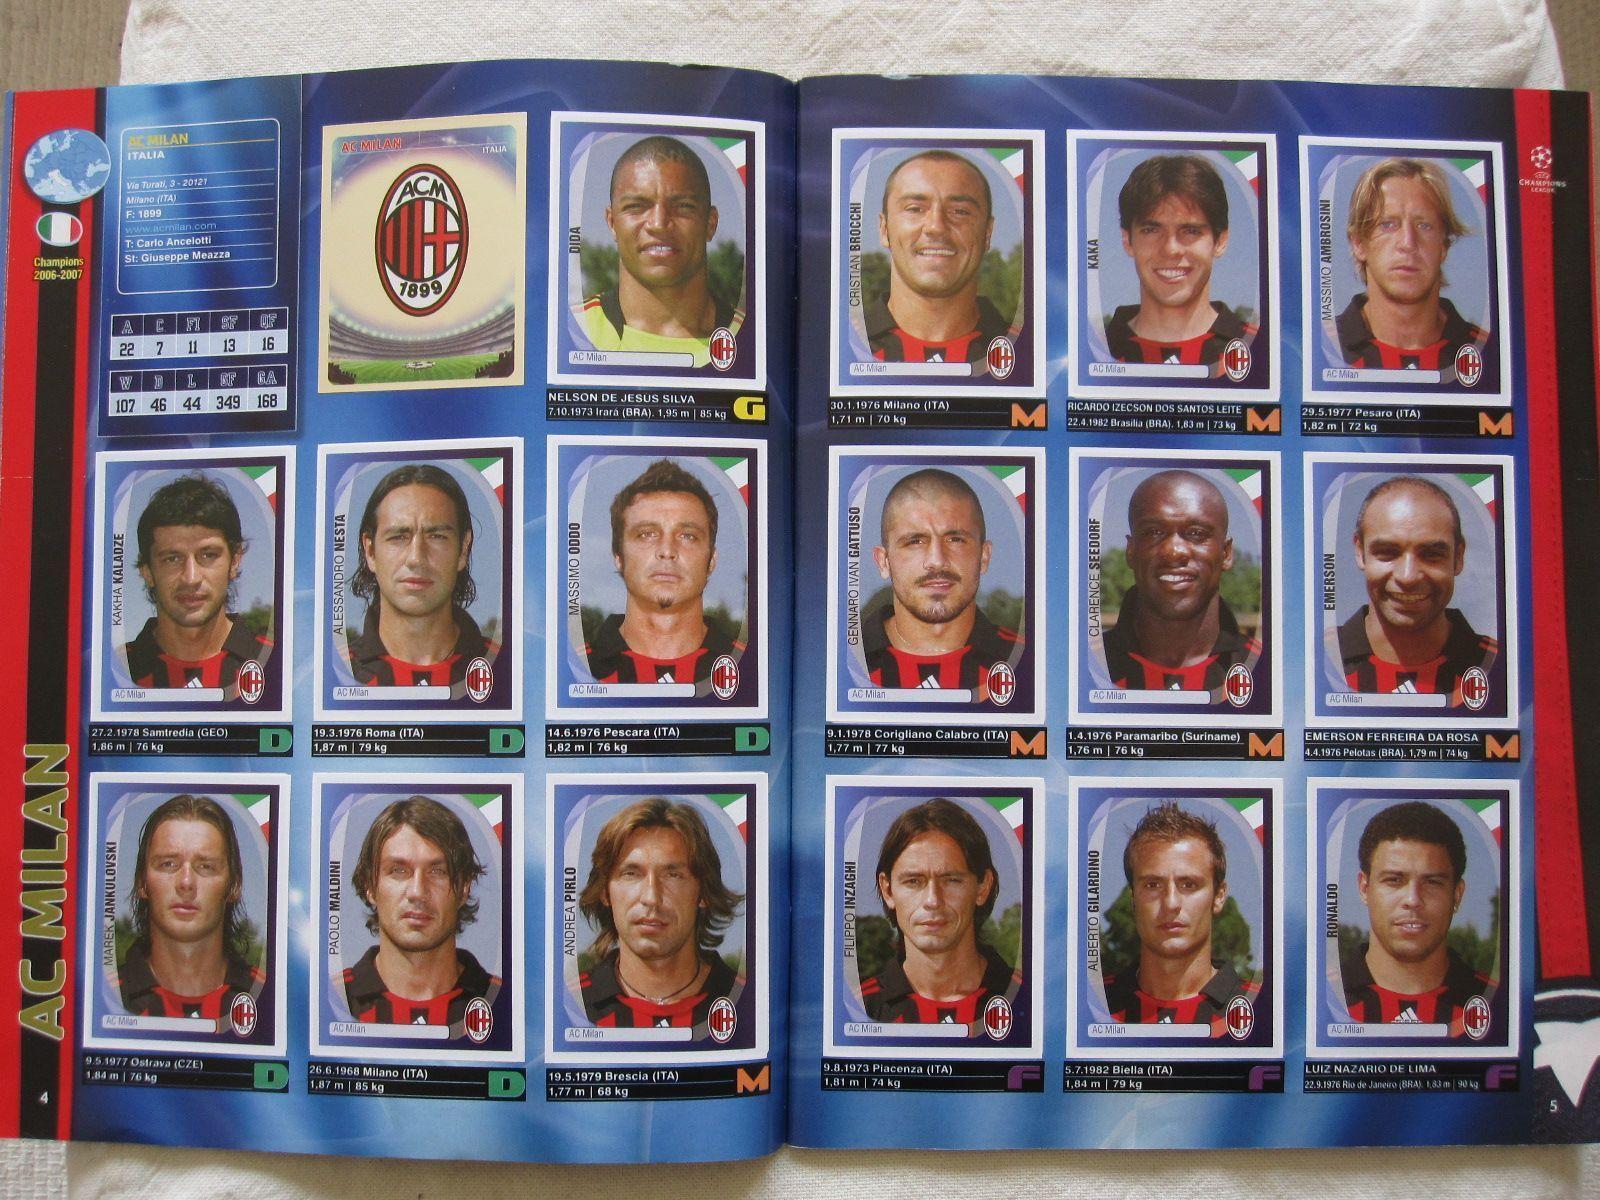 milan uefa champions league 2007 - photo#41